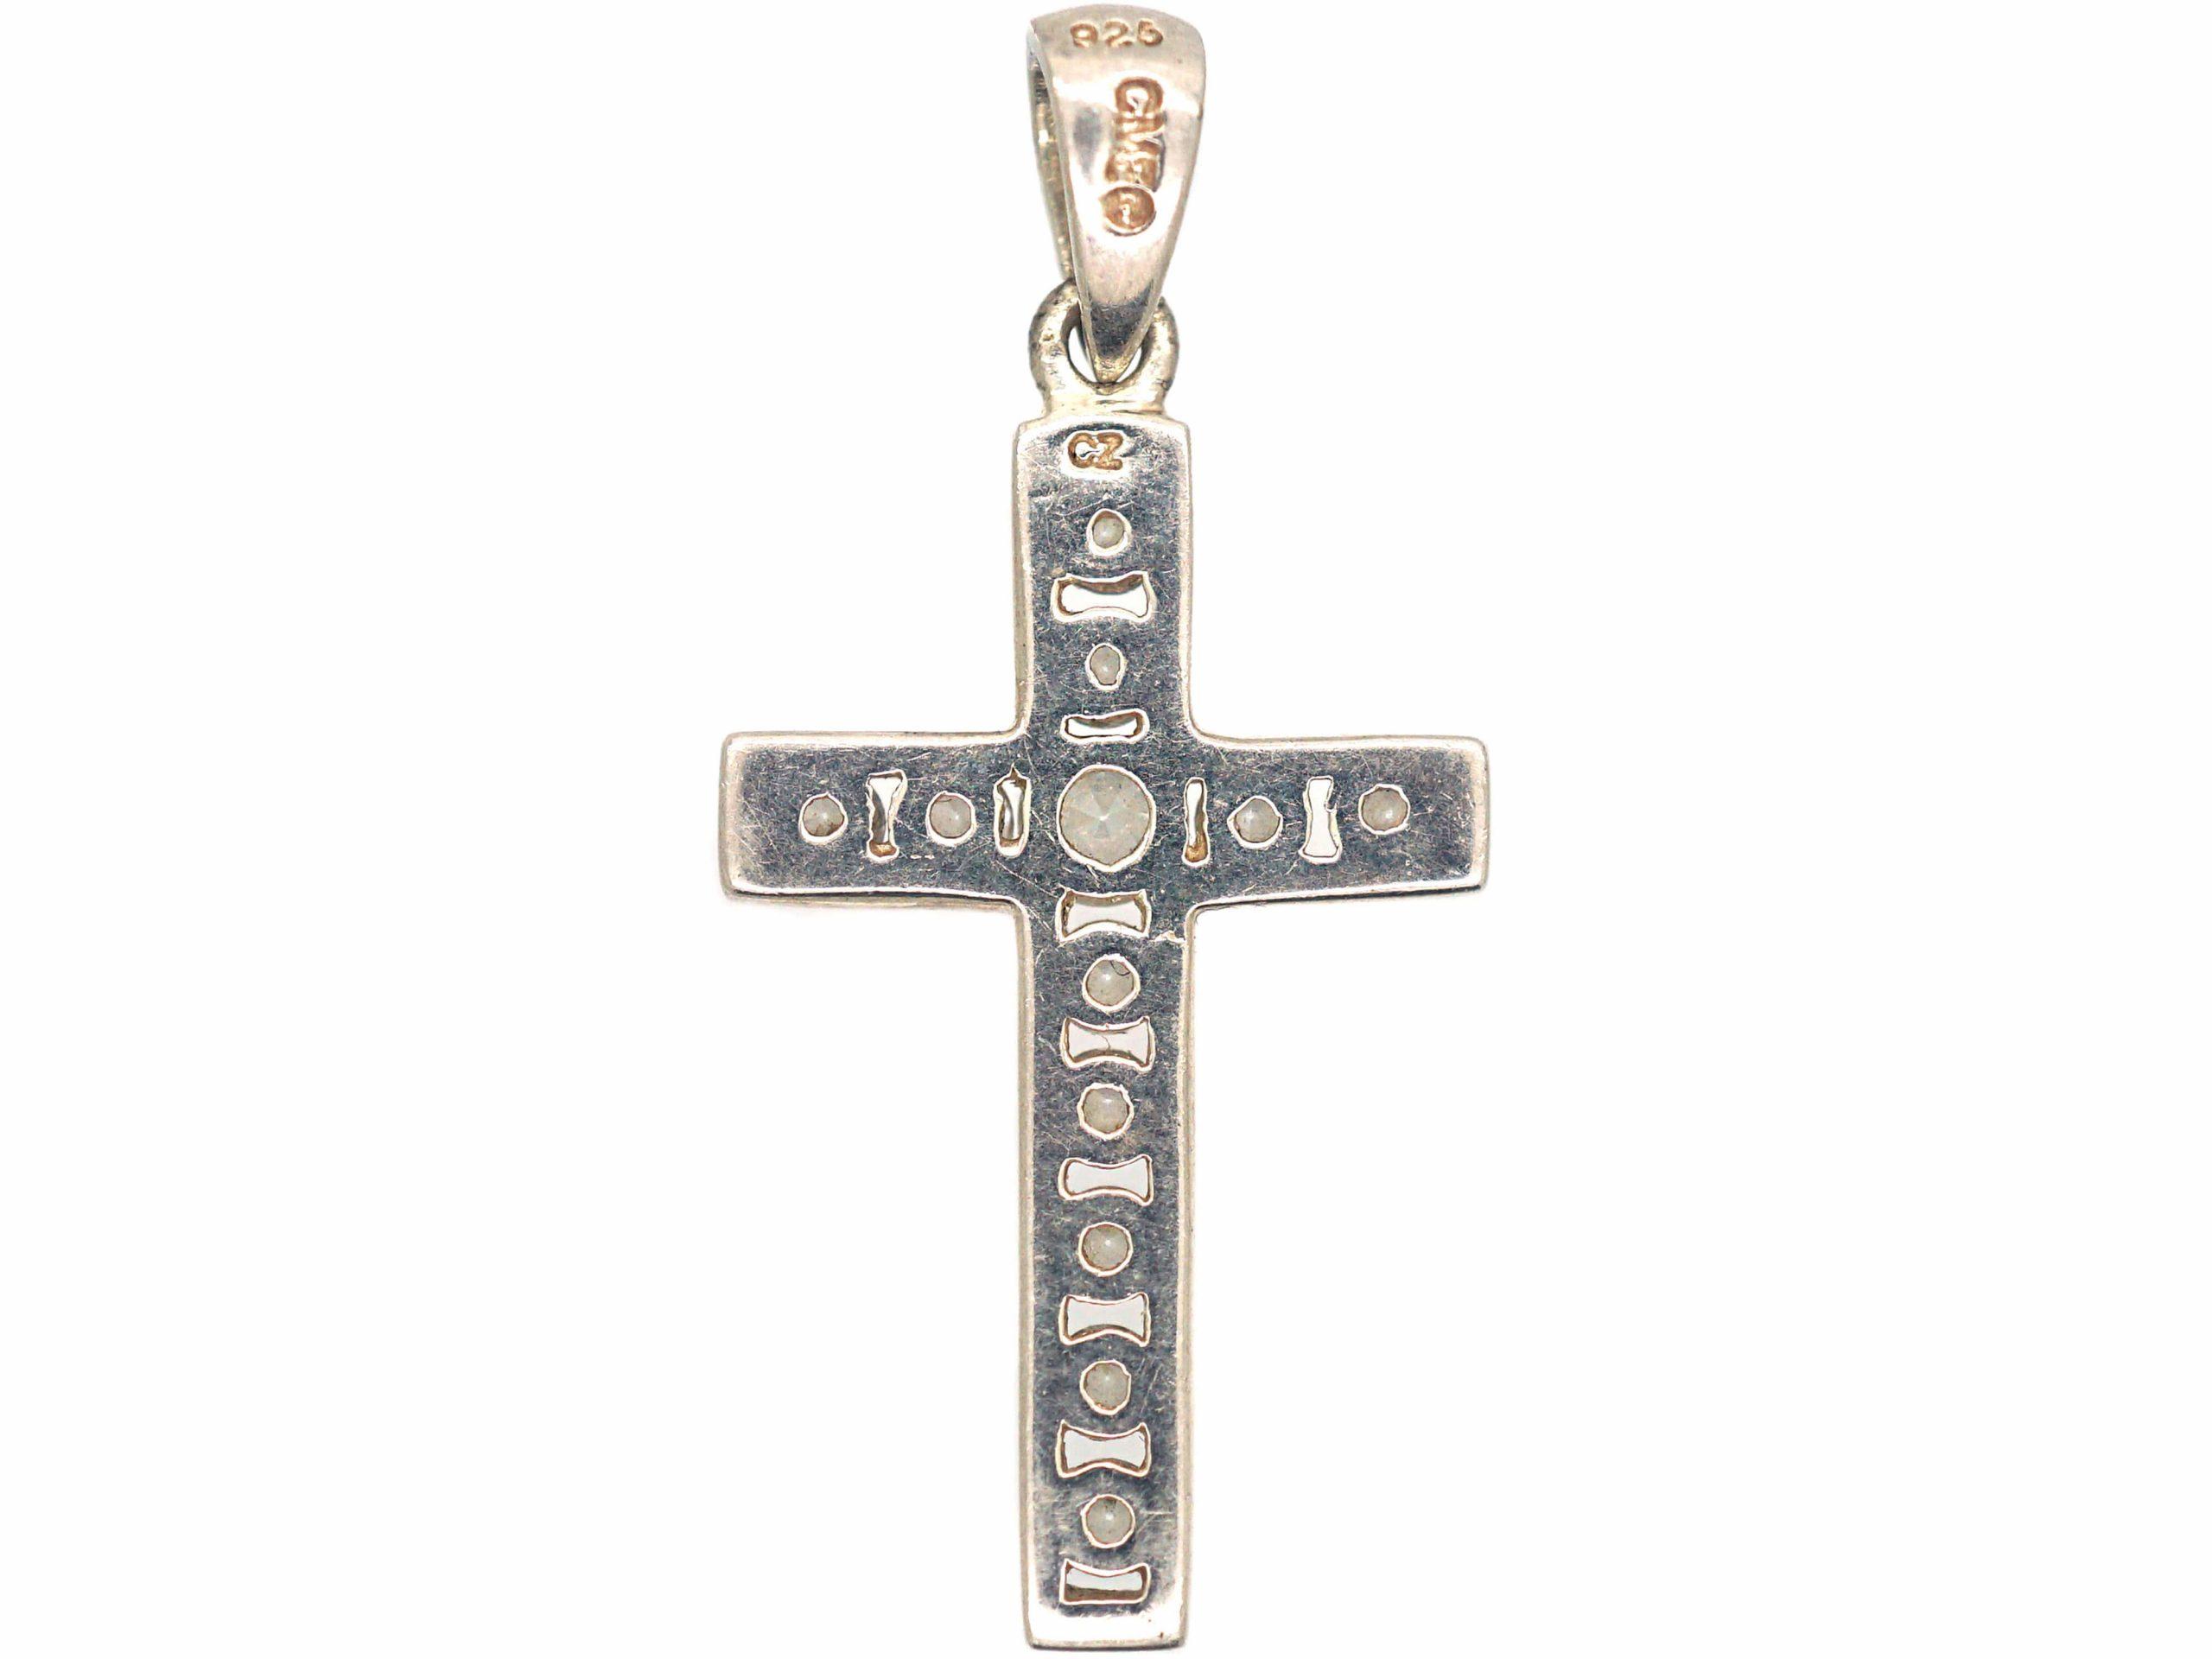 Silver & Paste Cross Pendant